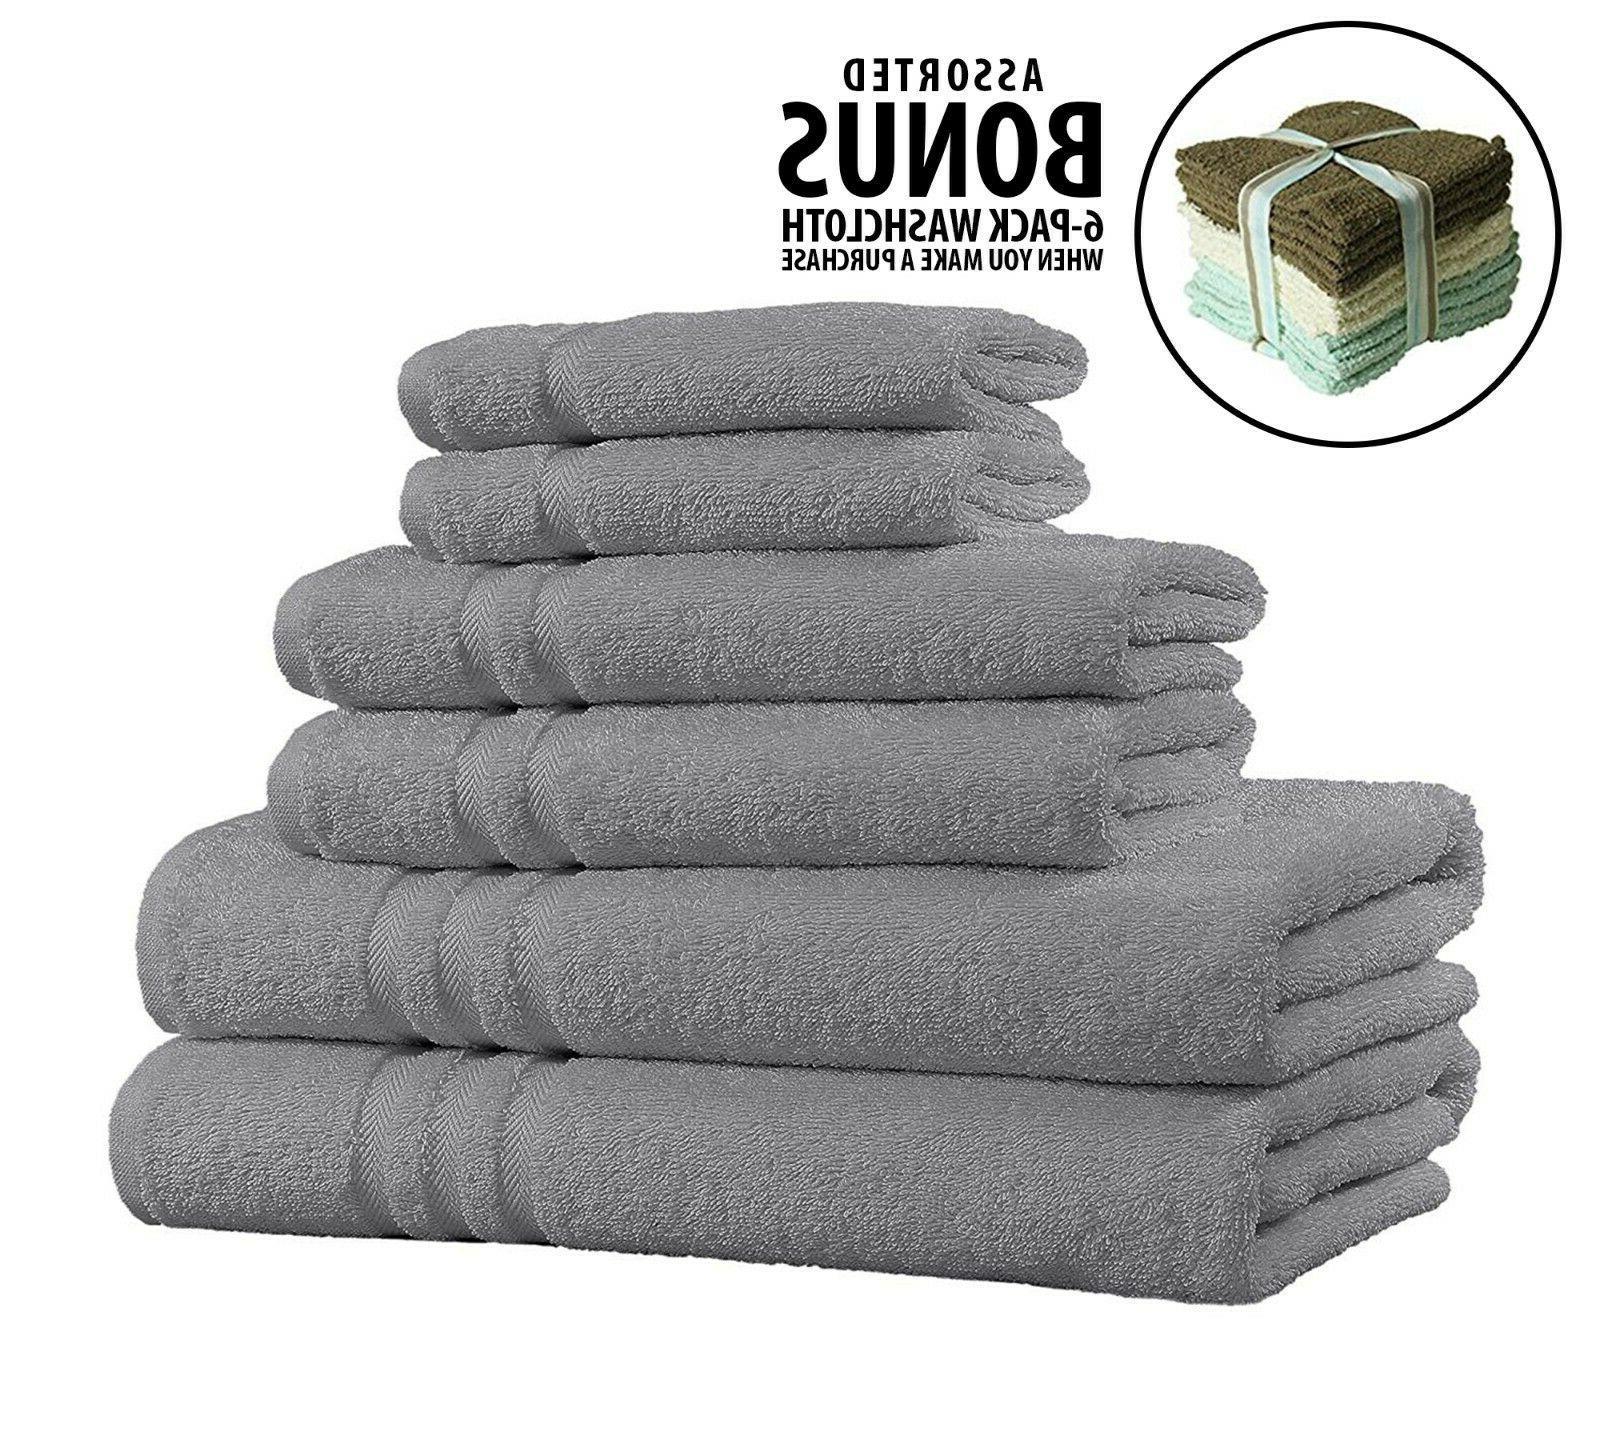 2//6//12pc 100/% Cotton Hand Towels Soft Absorbent Face Sheet Gym Bath Towels Set